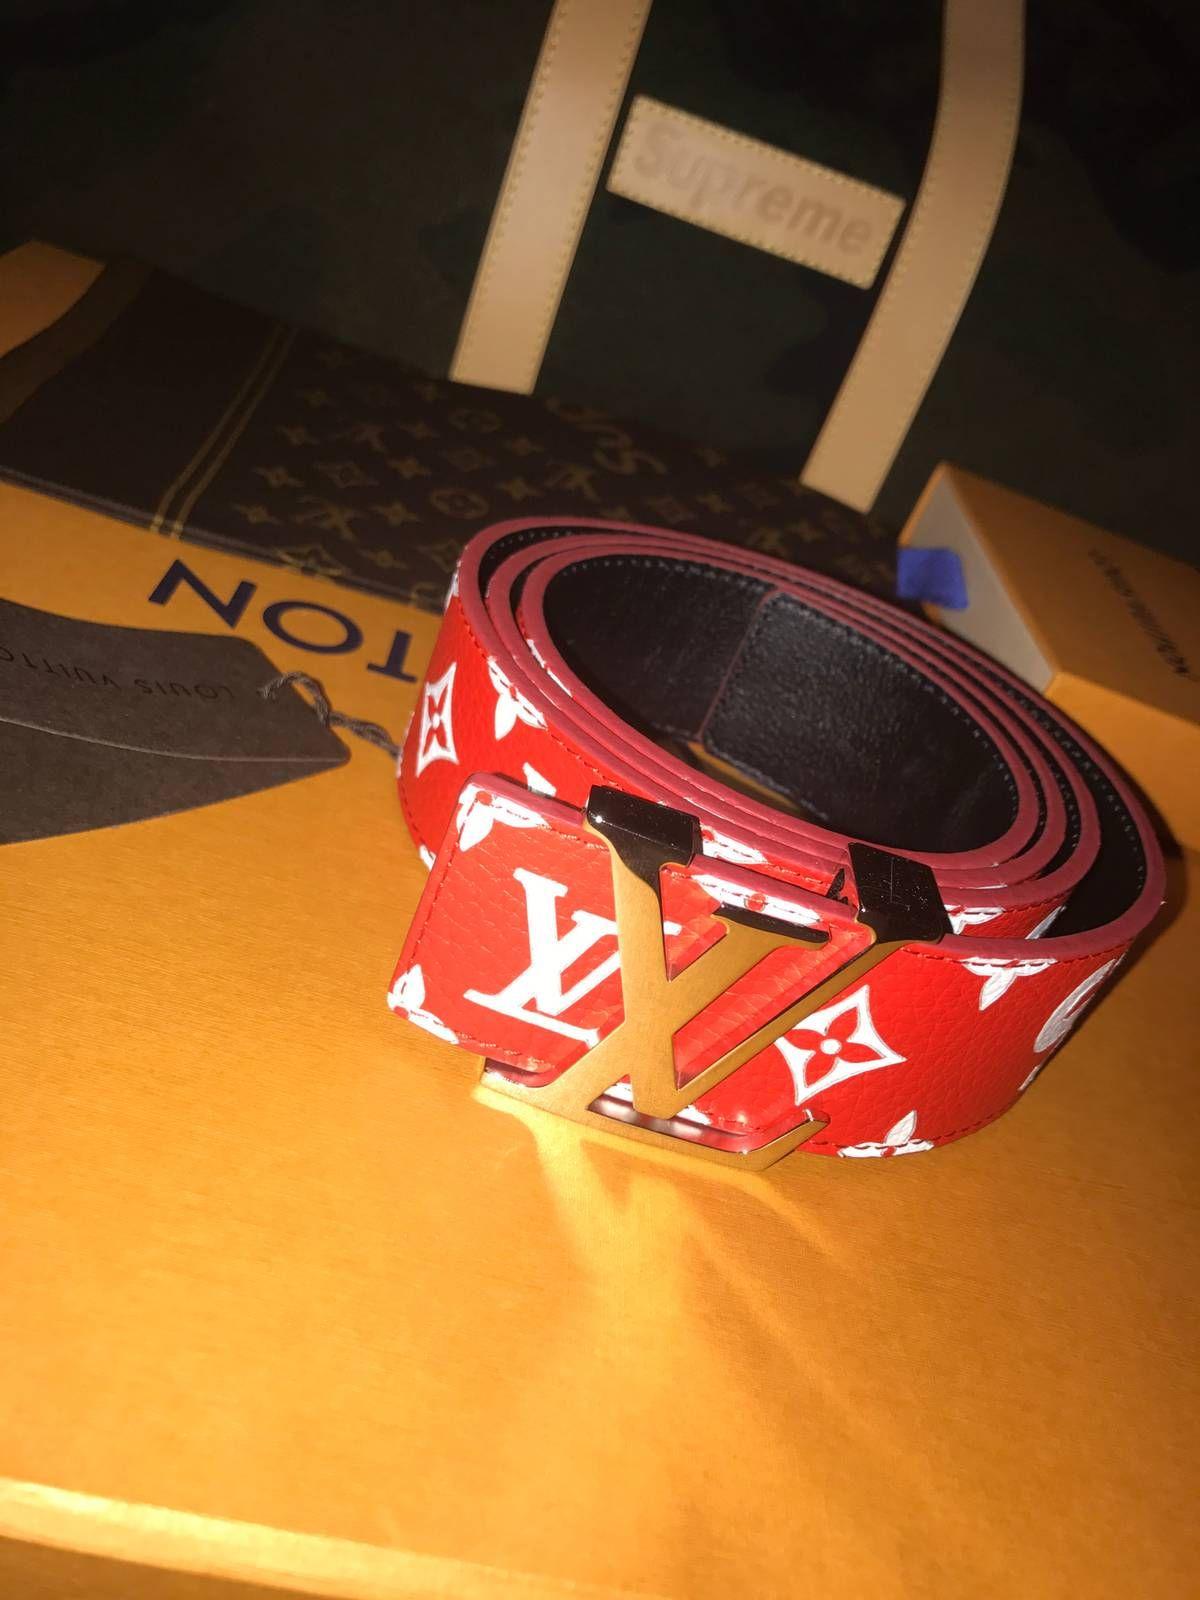 1e5953653ba4 Supreme Louis Vuitton Supreme red monogram belt Size 38 - Belts for Sale -  Grailed